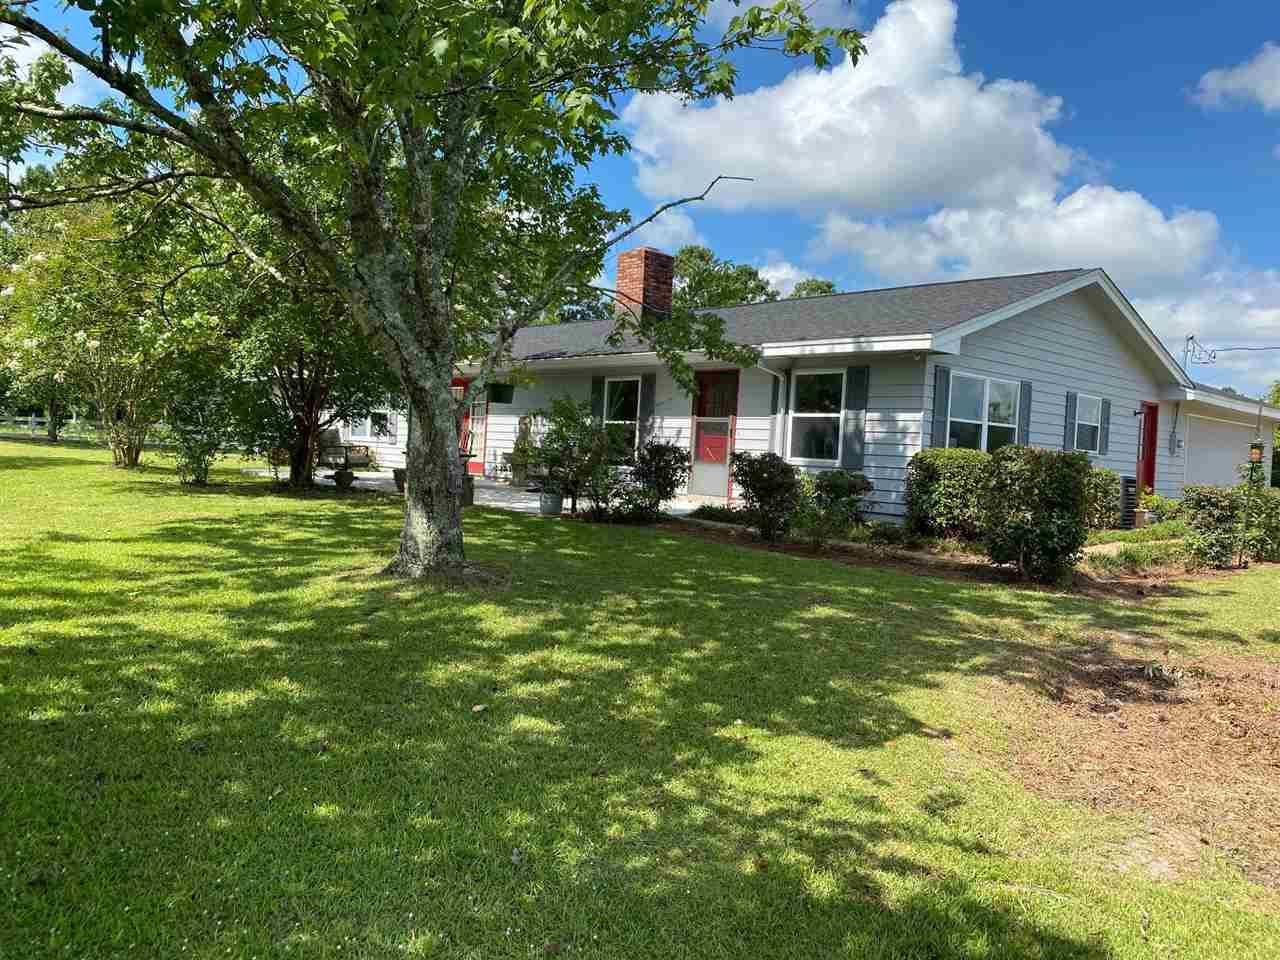 Photo of 414 Malcolm Smith Road, CHATTAHOOCHEE, FL 32324-3657 (MLS # 316742)